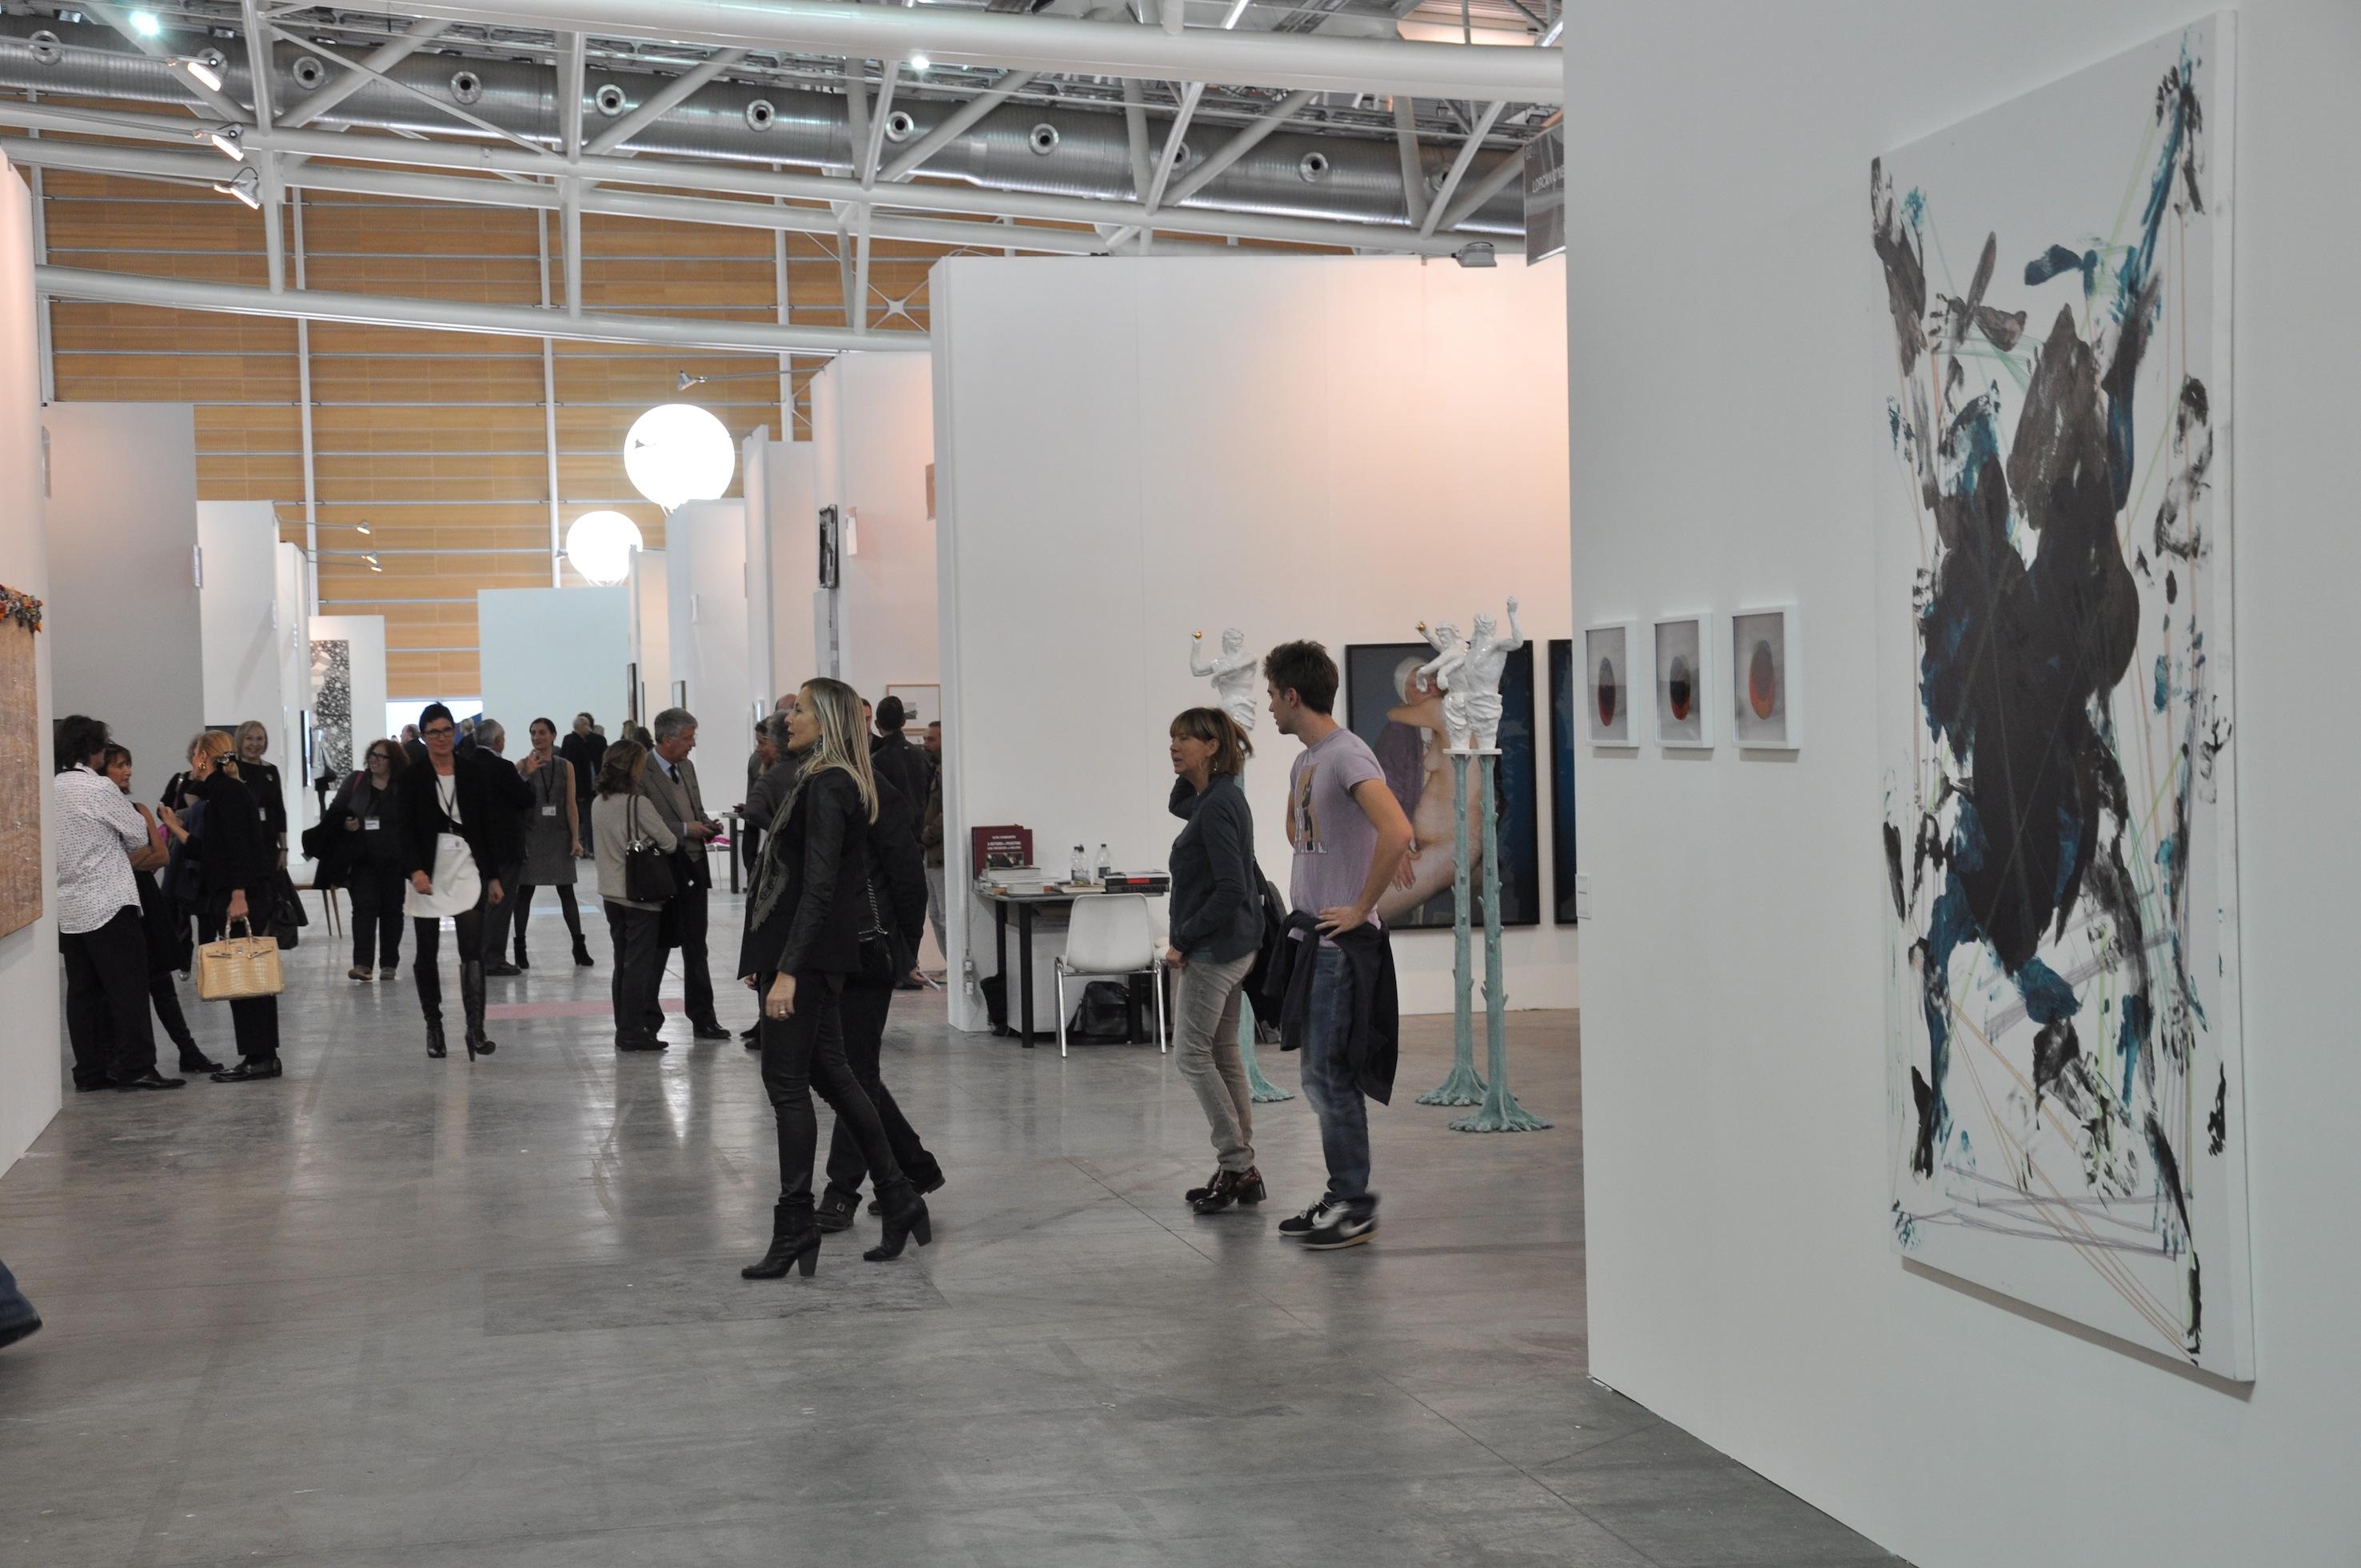 Artissima 2014, copyright Enrico Frignani